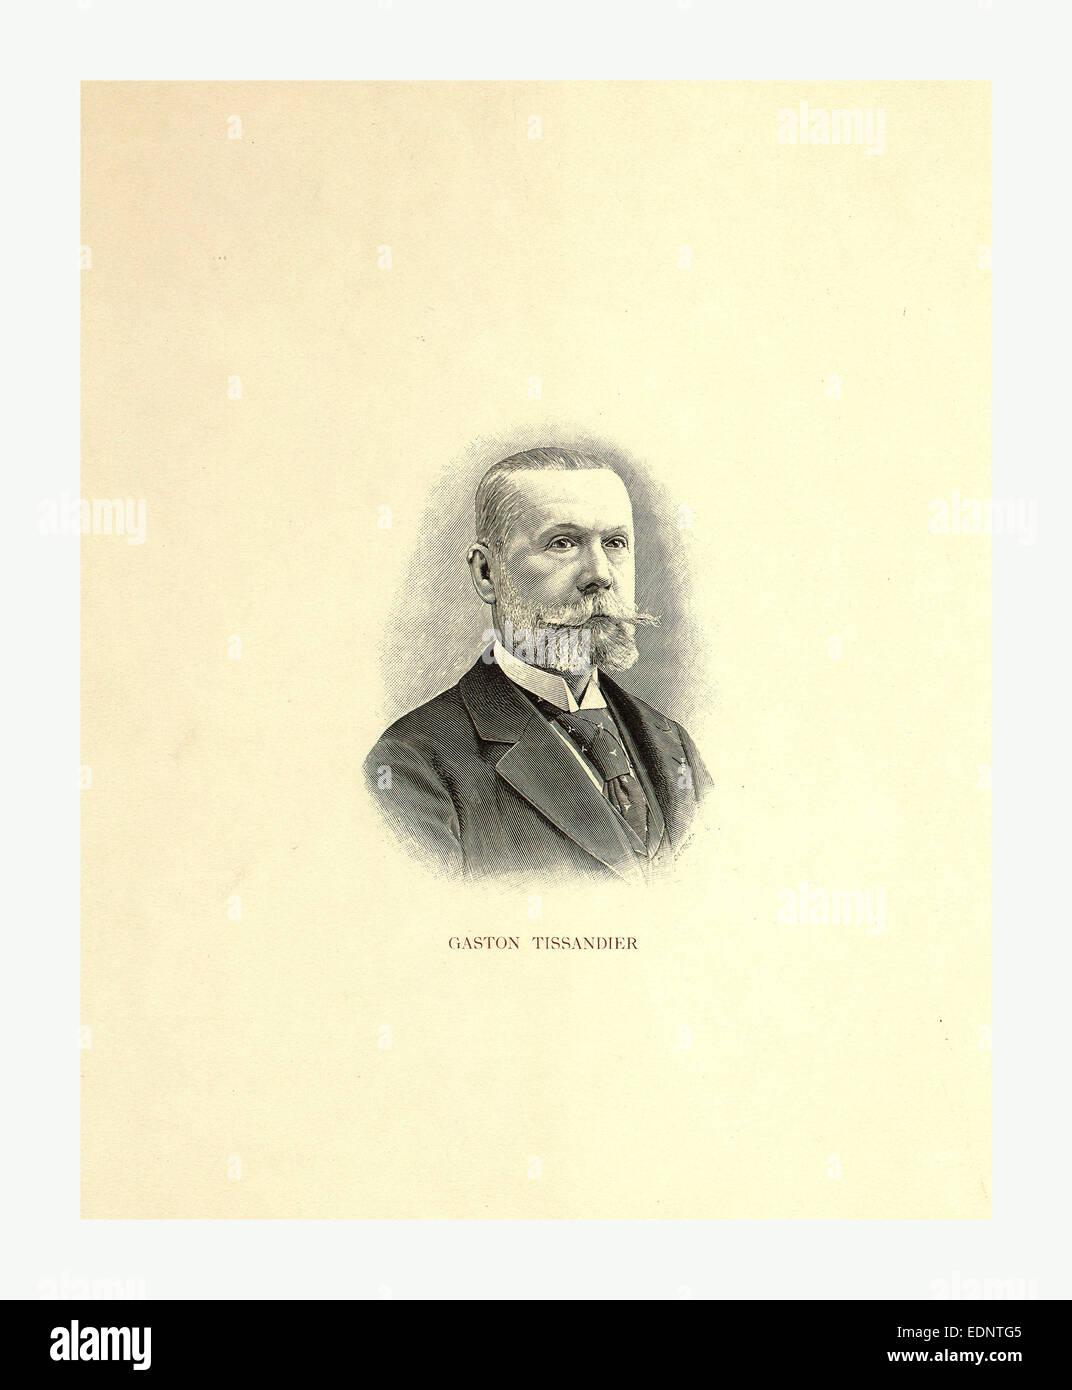 Gaston Tissandier by Ch. Dietrich, sculps., Paris between 1880 and 1900 - Stock Image